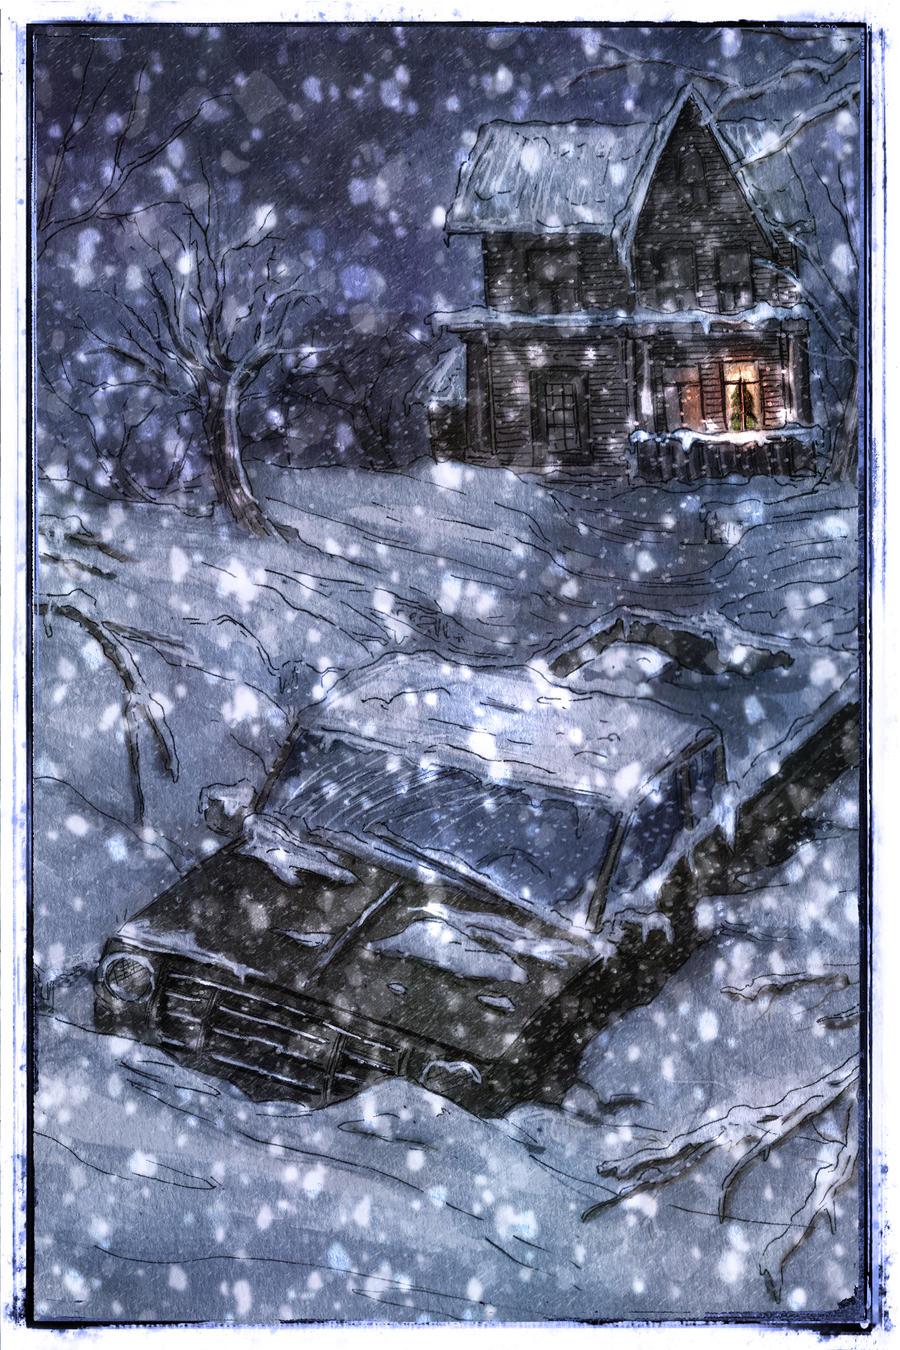 Christmas Book Pix 3 by denlm